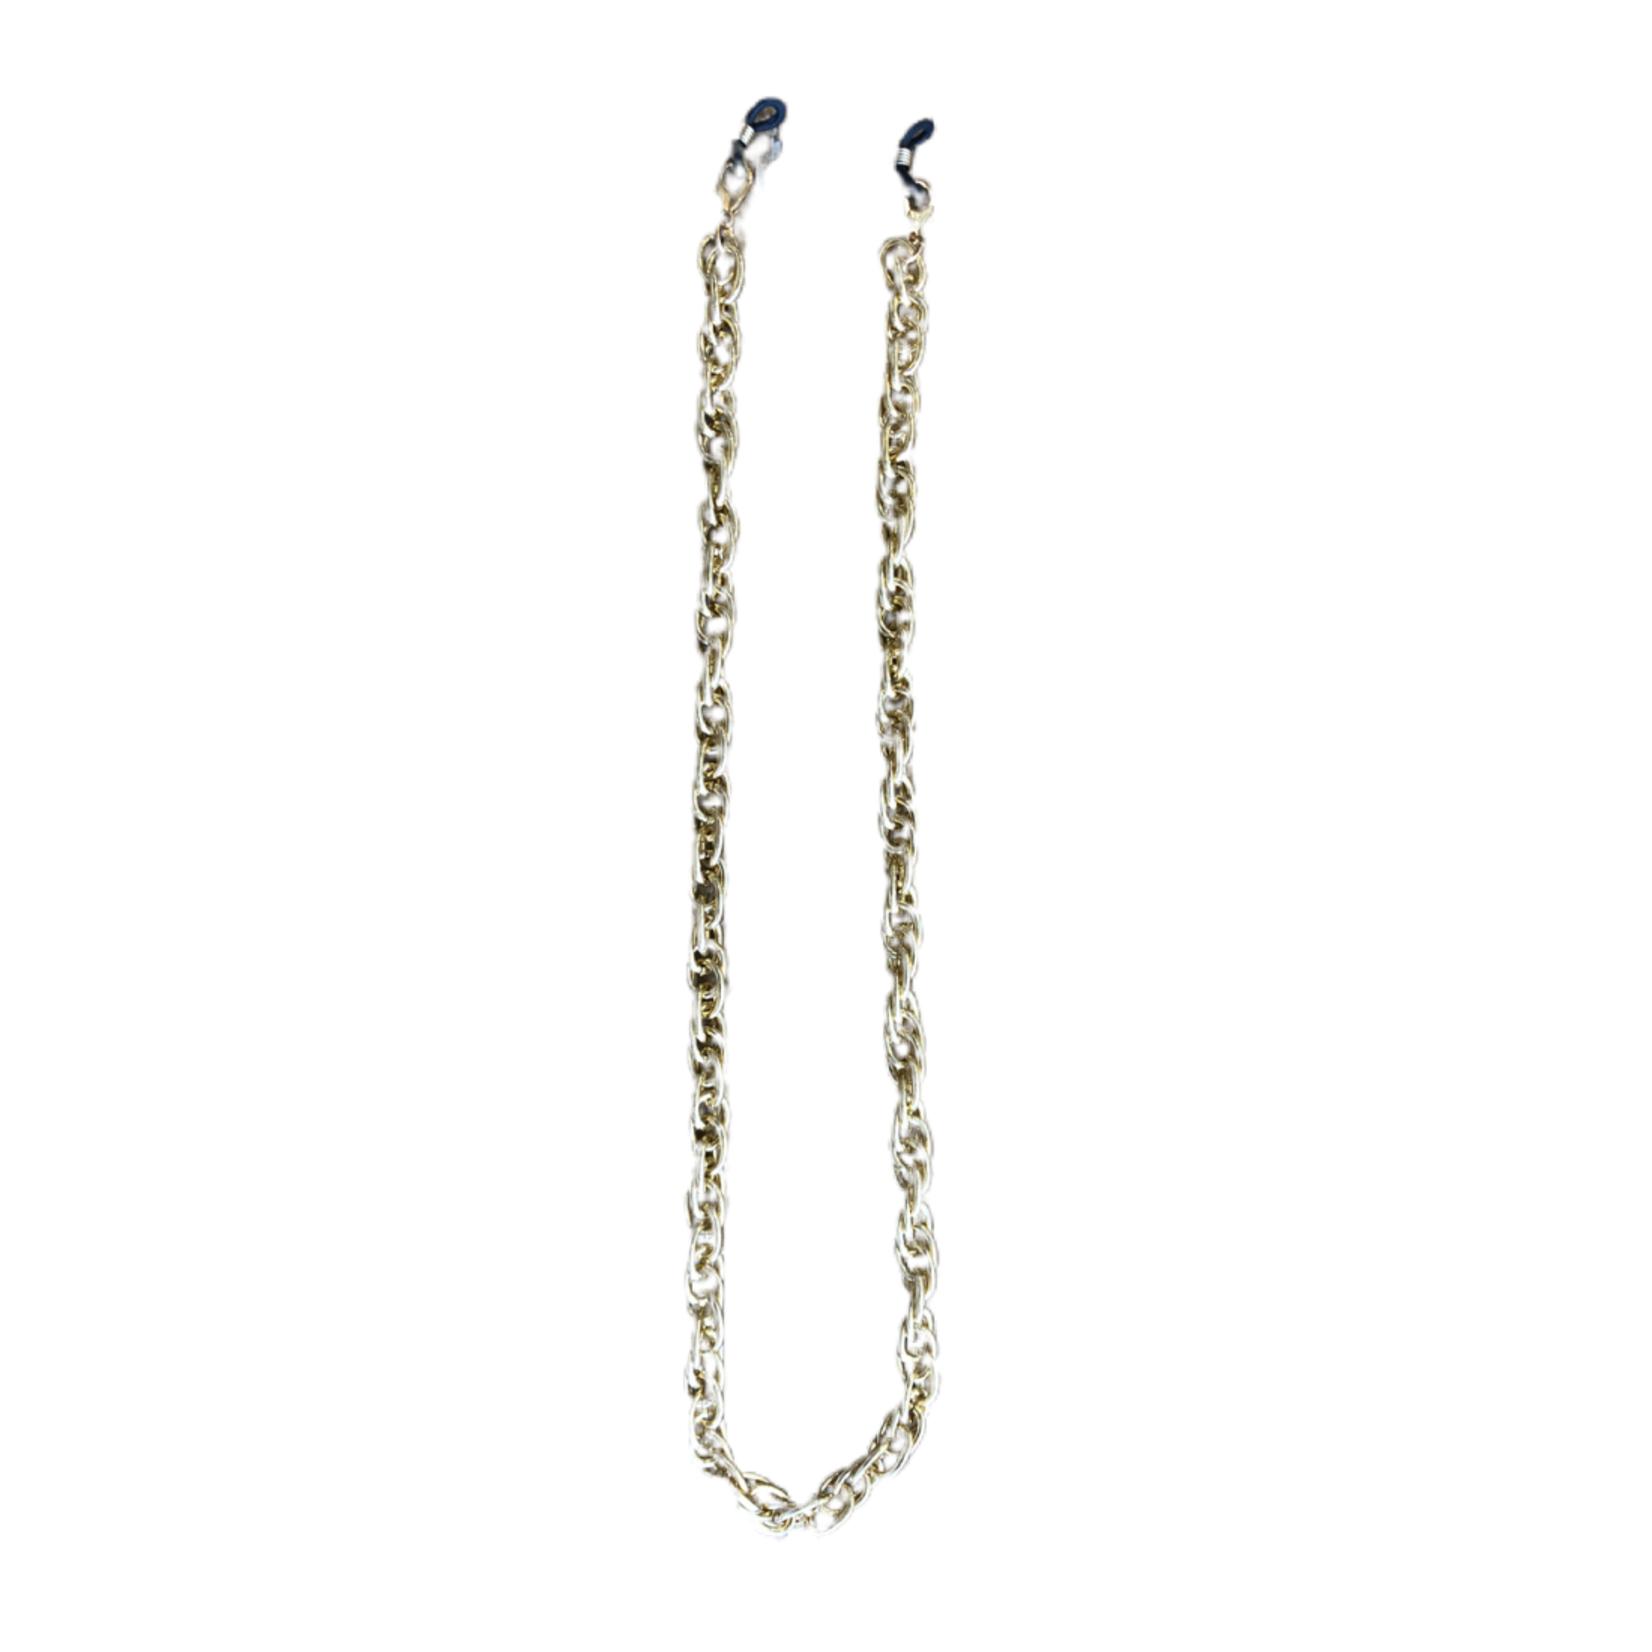 Wyld Blue Round Link Mask Chain